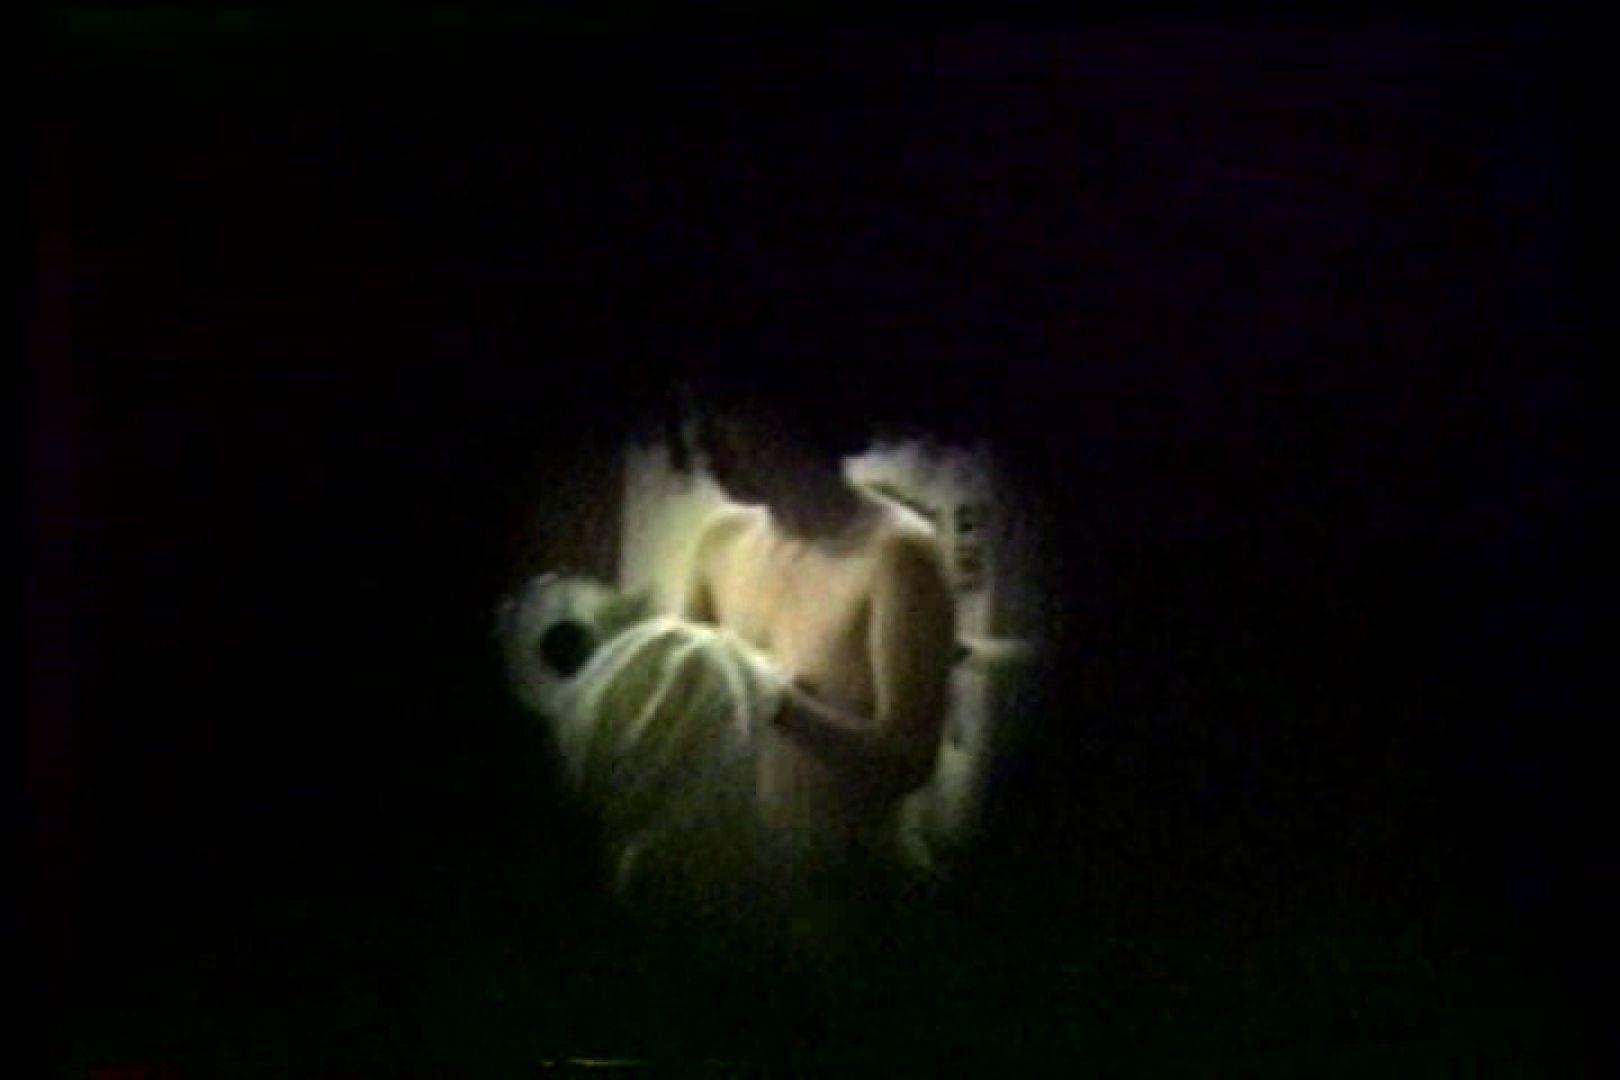 STY-018 仰天!どうして撮れたか? 前編 裸体 われめAV動画紹介 107pic 92